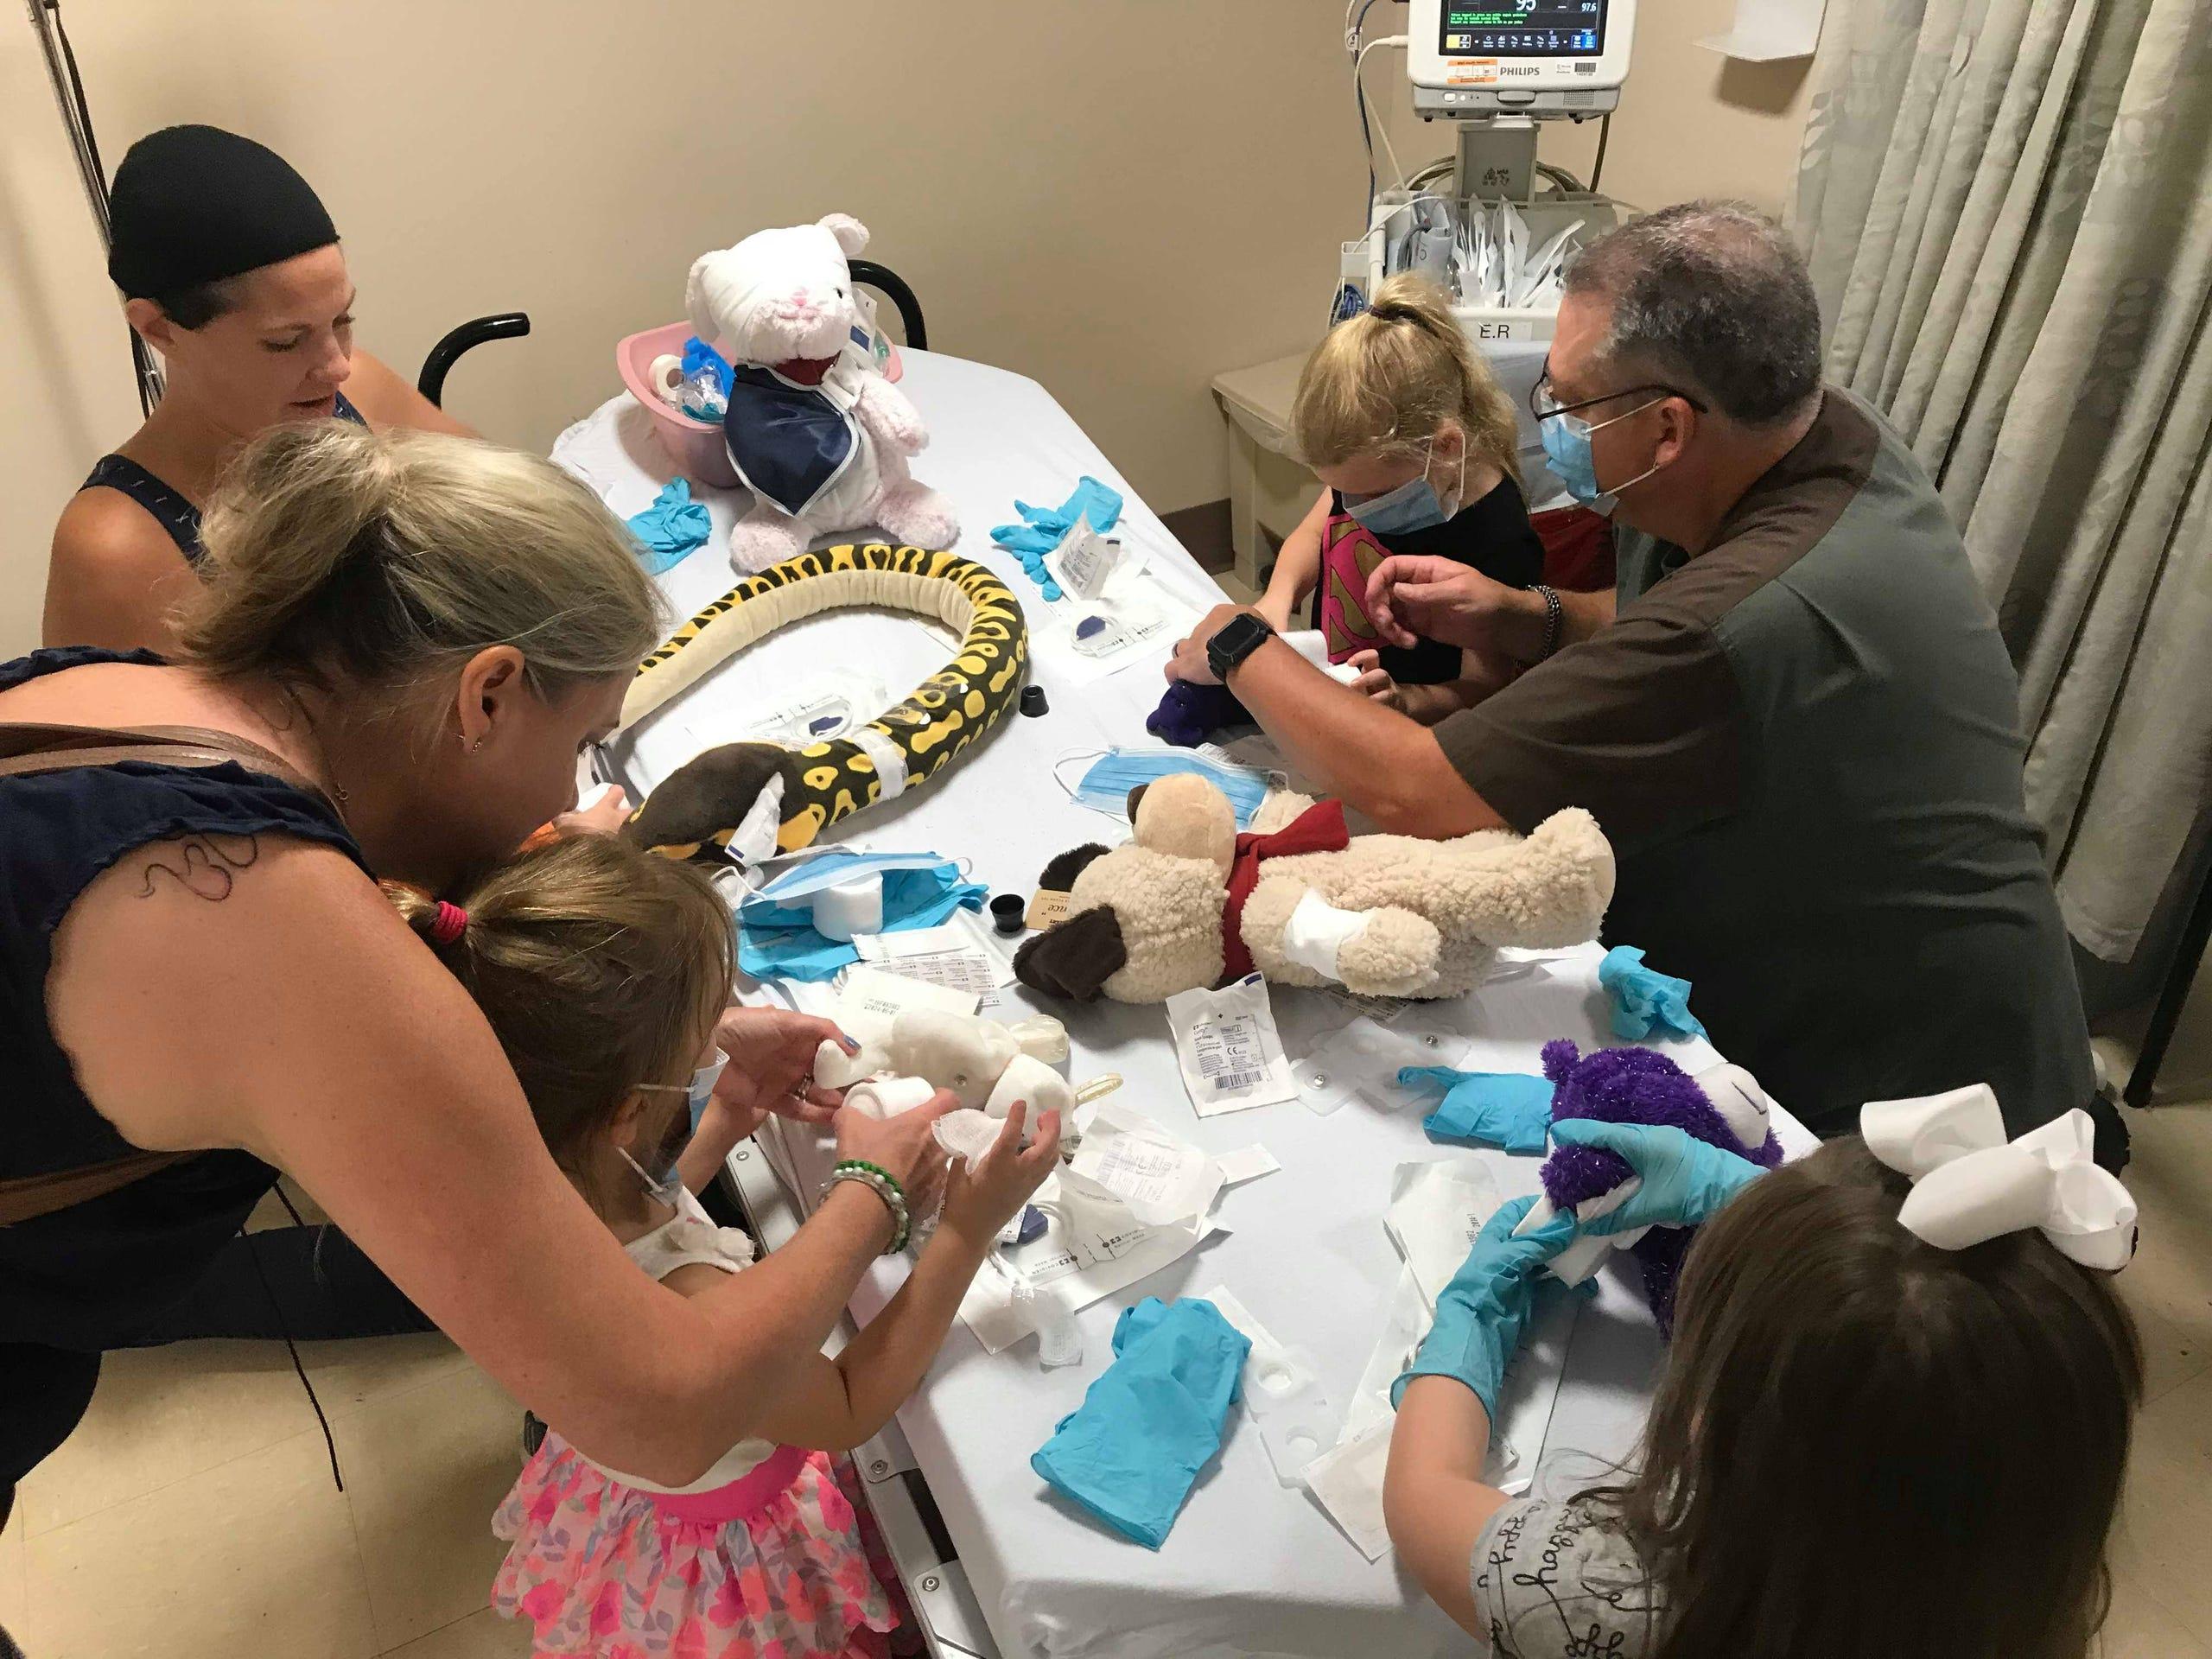 MidHudson Regional Hospital hosts teddy bear clinic